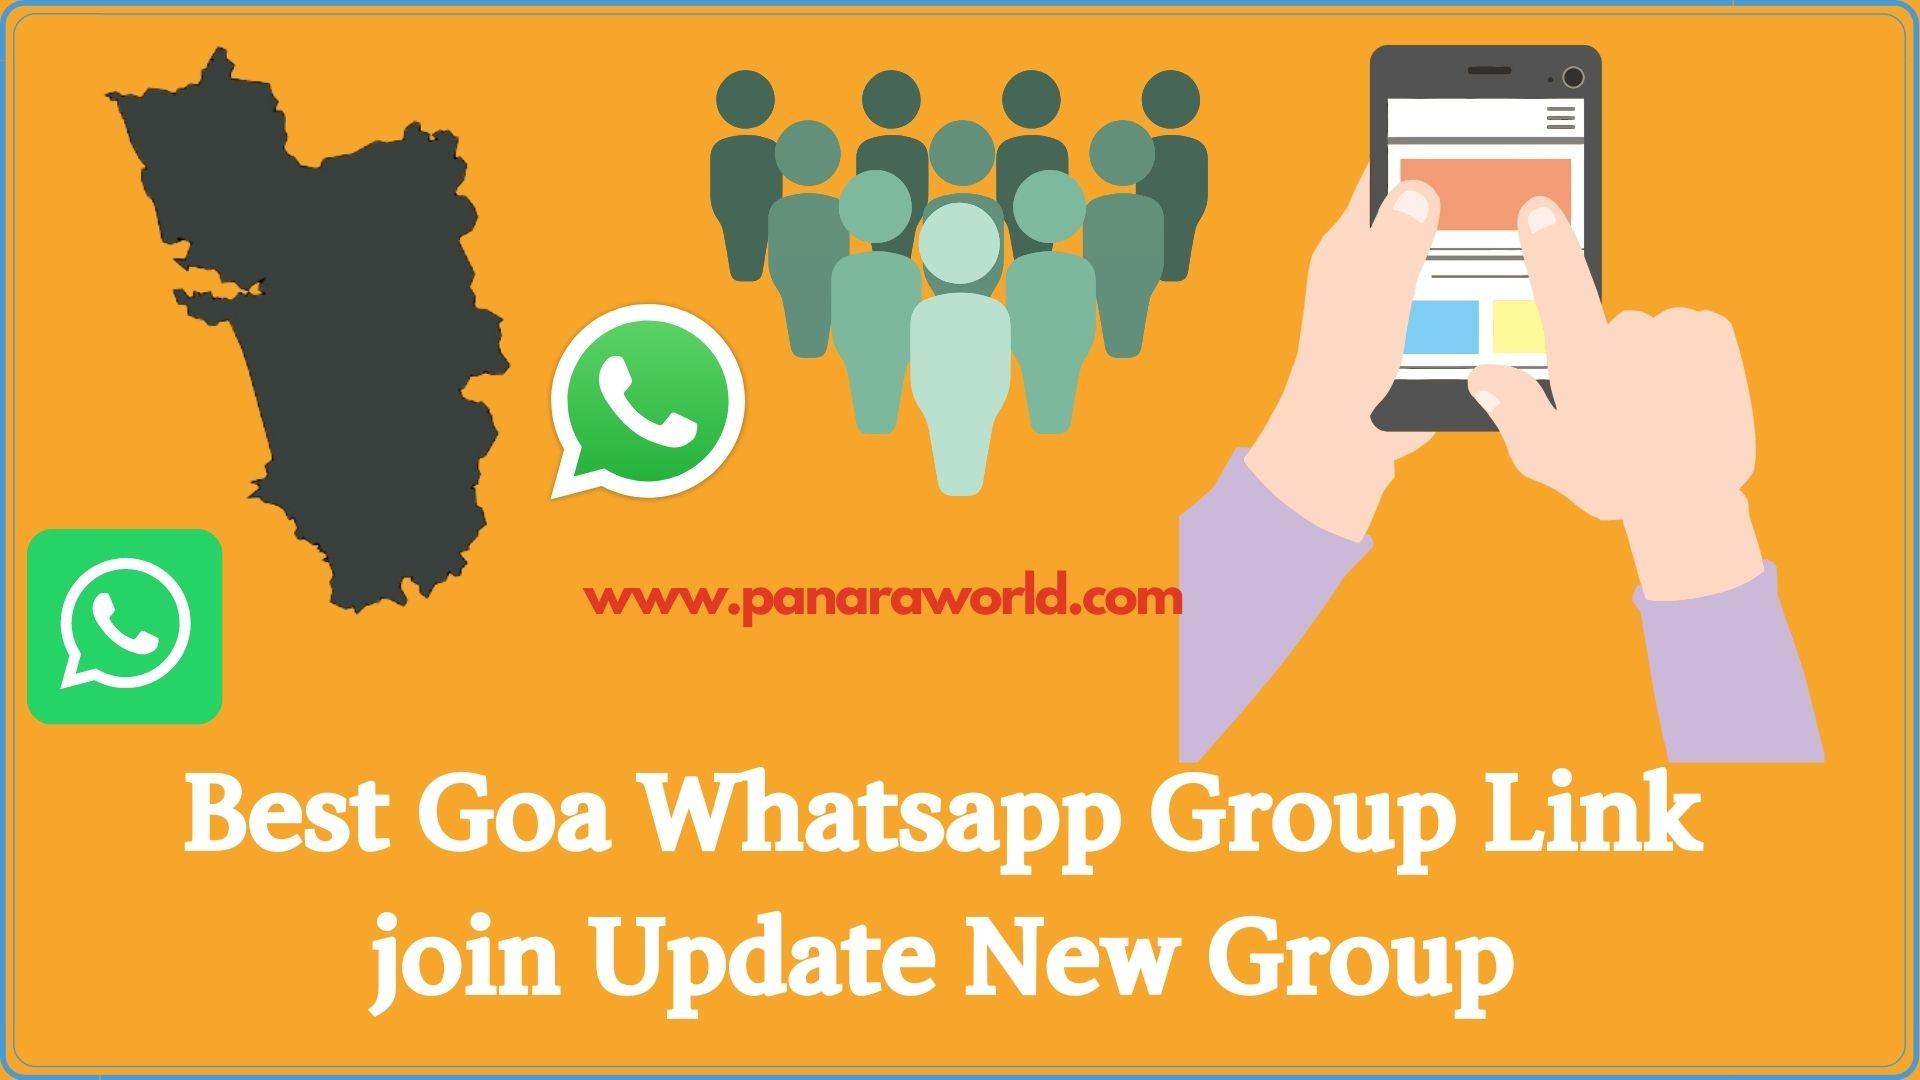 Best Goa Whatsapp Group Link